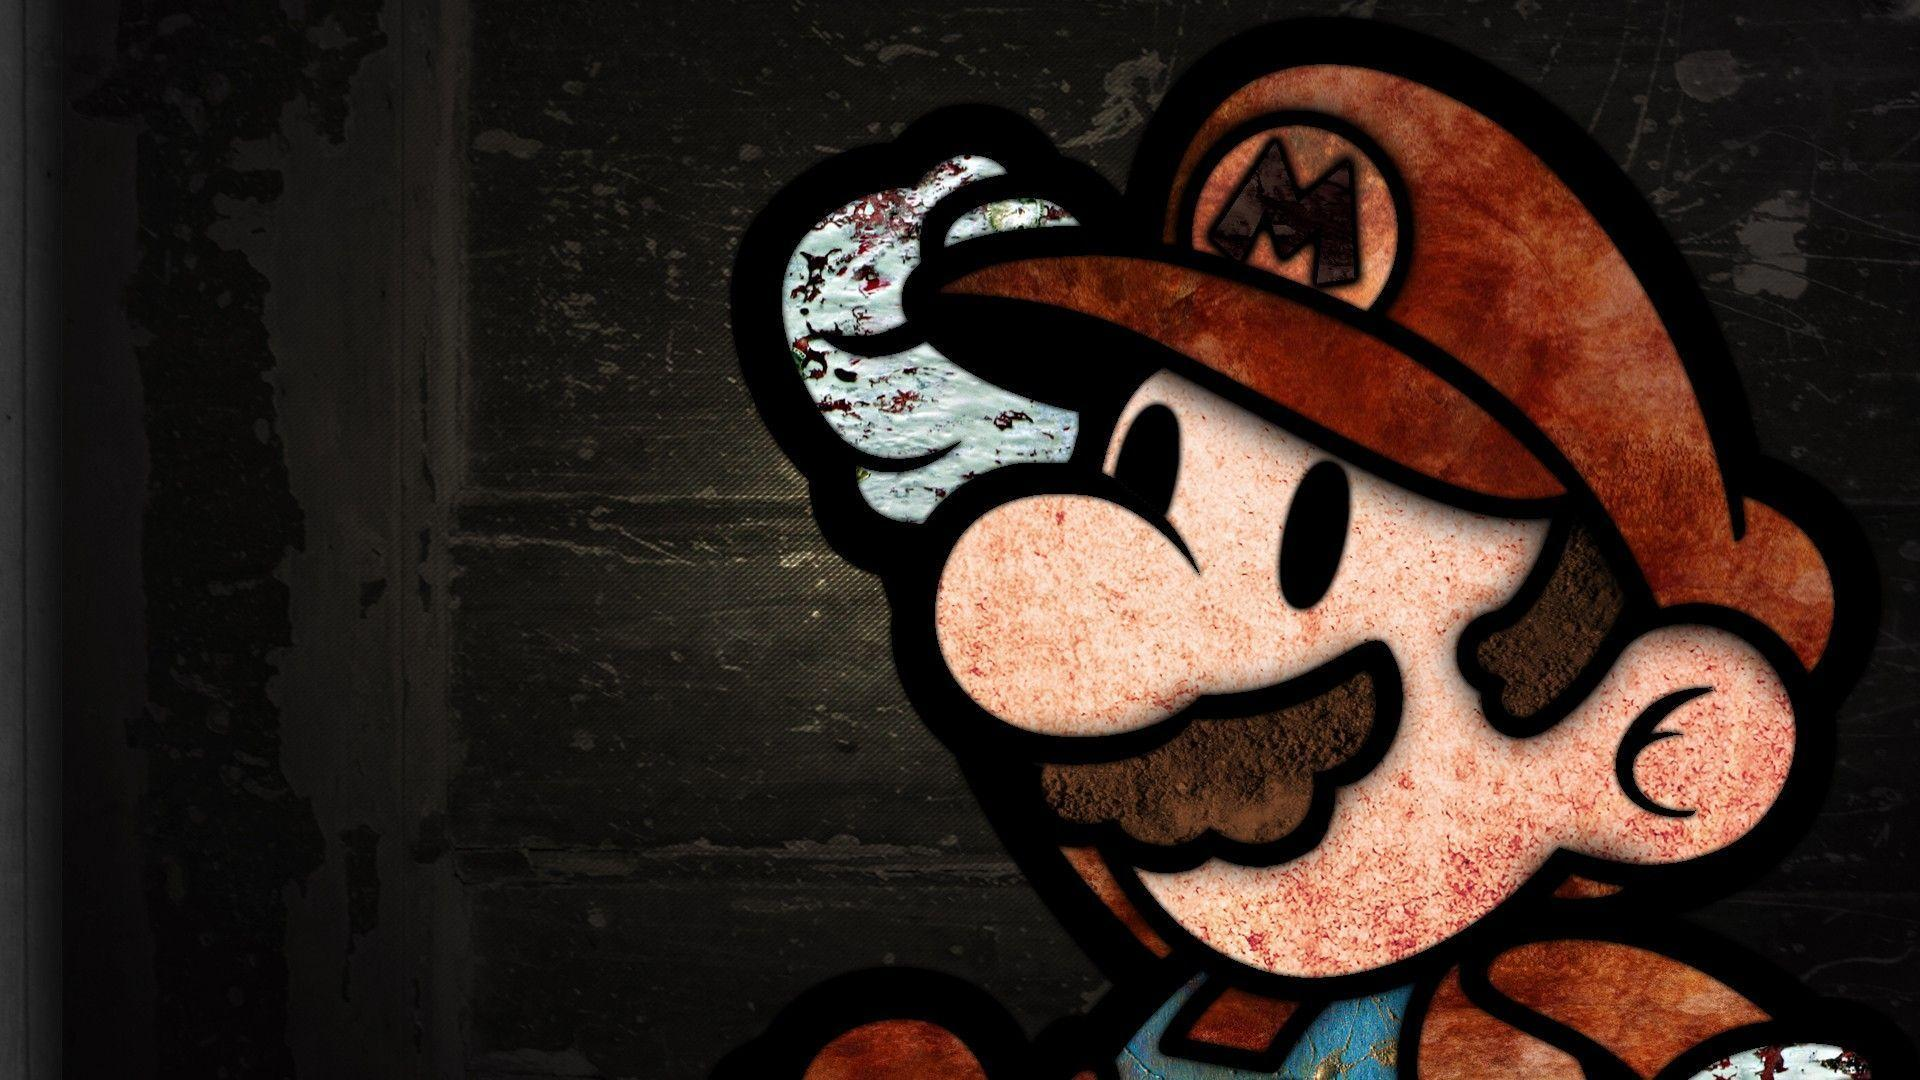 Image - Mario-mario-wallpaper-hd-games-1920x1080.jpg - Bogna1104 Wiki